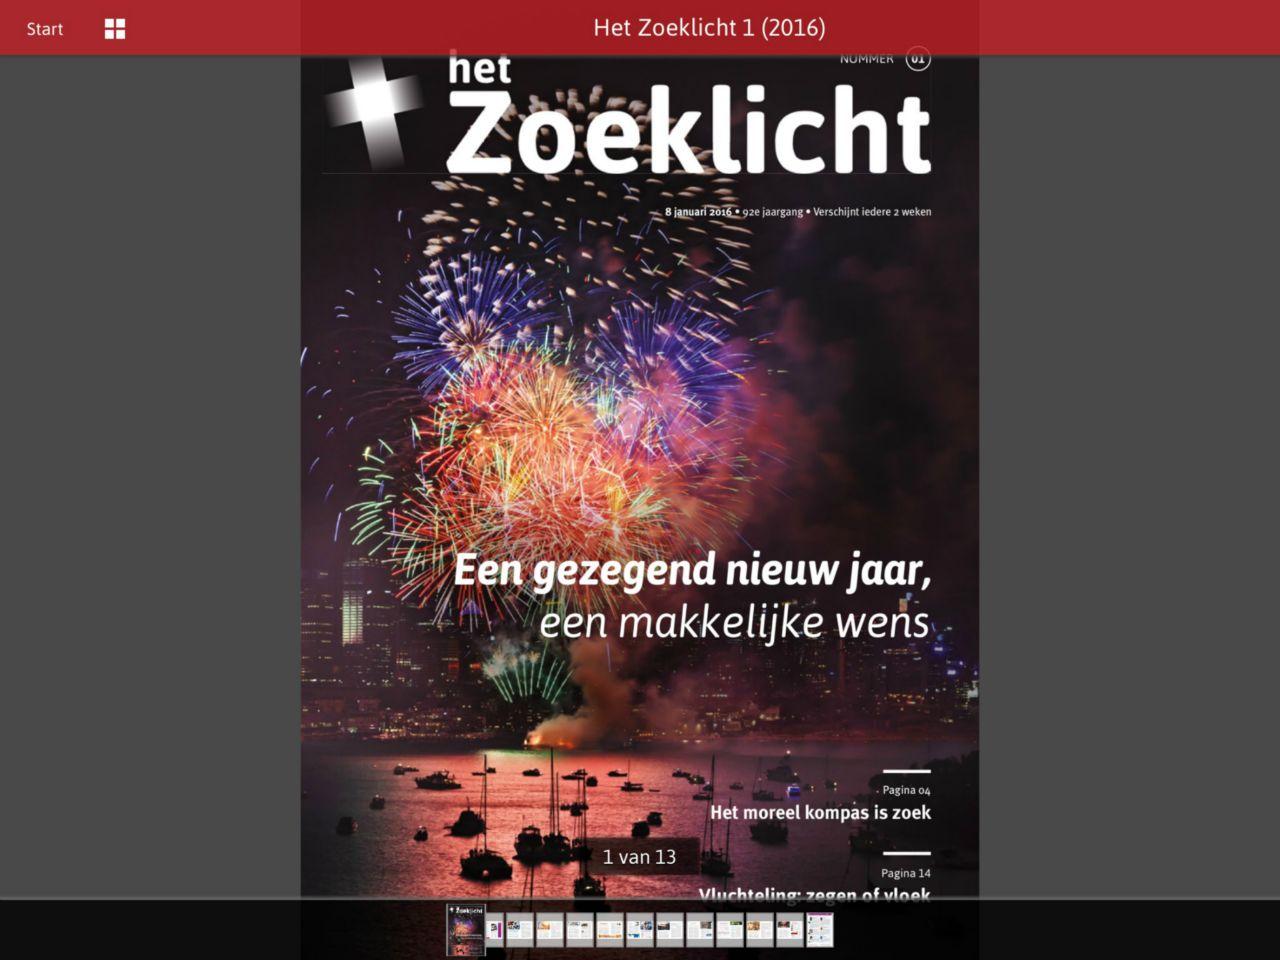 Zoeklicht-app HZ 1